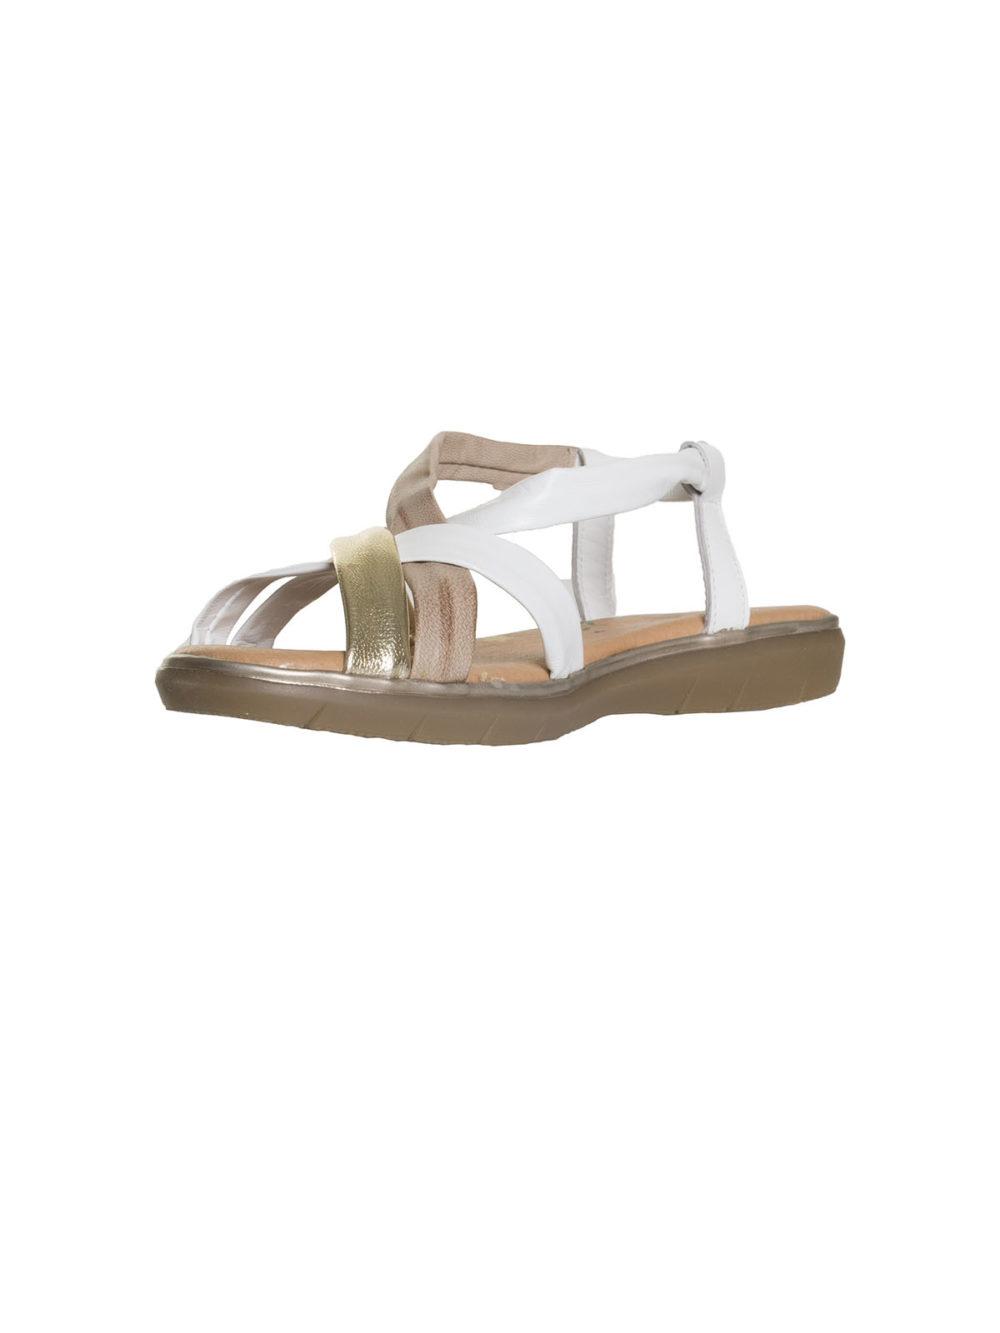 Emy Cara Platino Sandal Marila Shoes Katie Kerr Women's Clothing